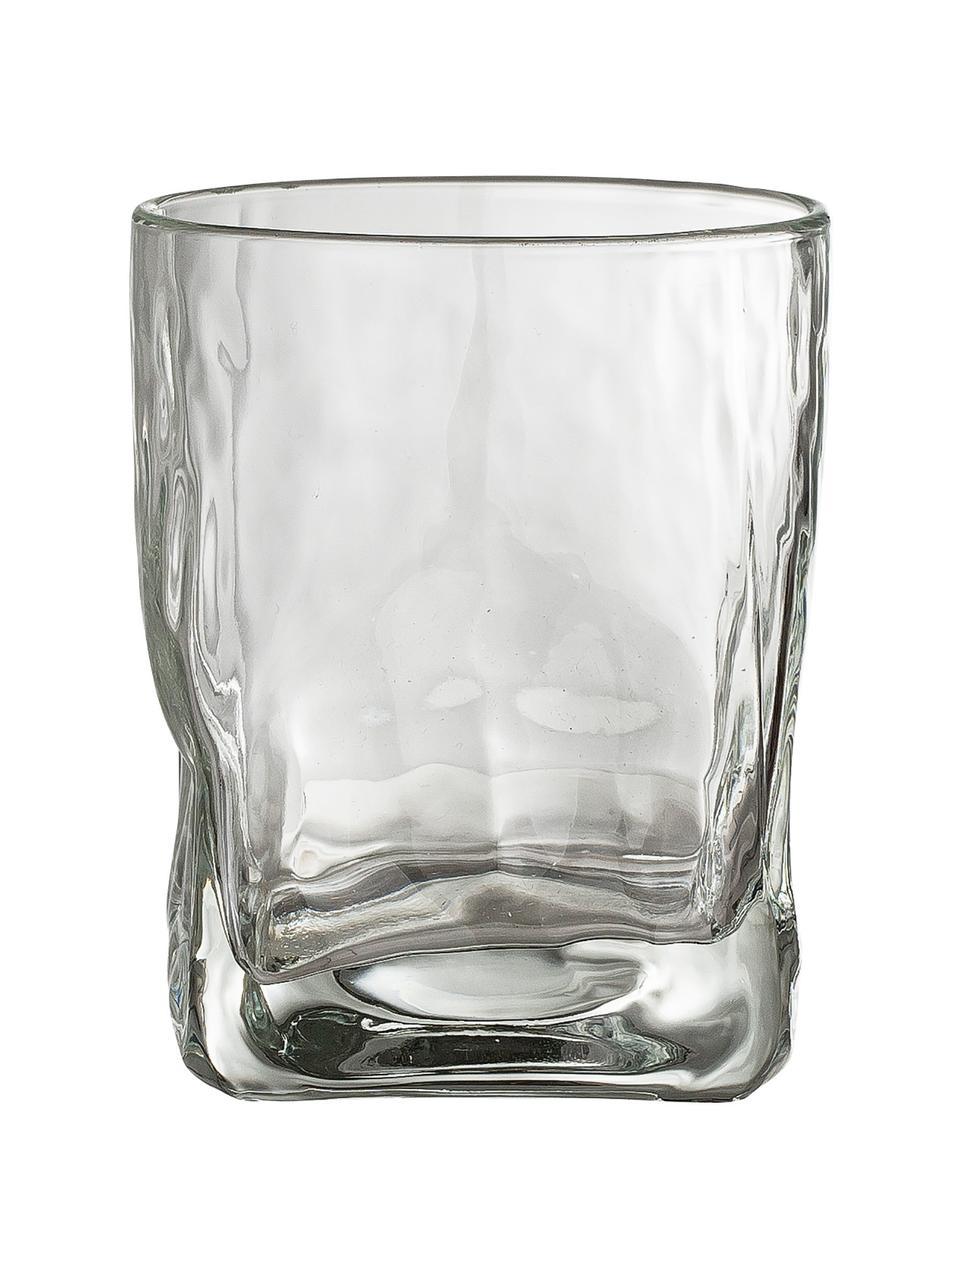 Vasos old fashioned irregulares Zera, 6 uds., Vidrio, Transparente, Ø 8 x Al 10 cm